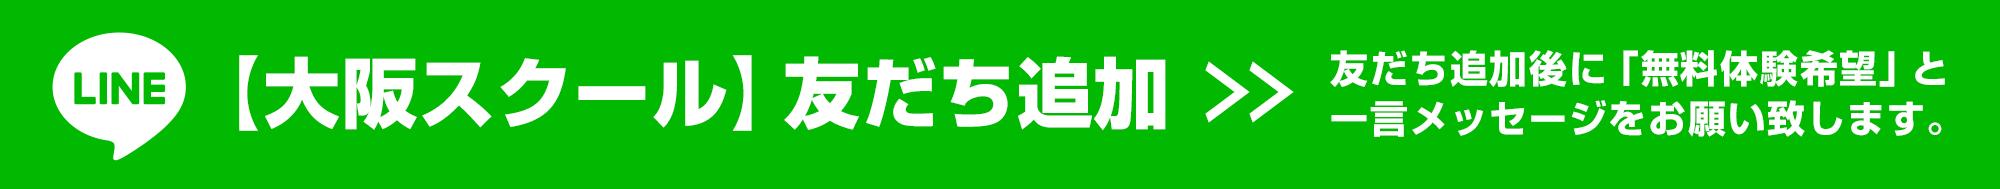 LINE大阪スクール友だち登録